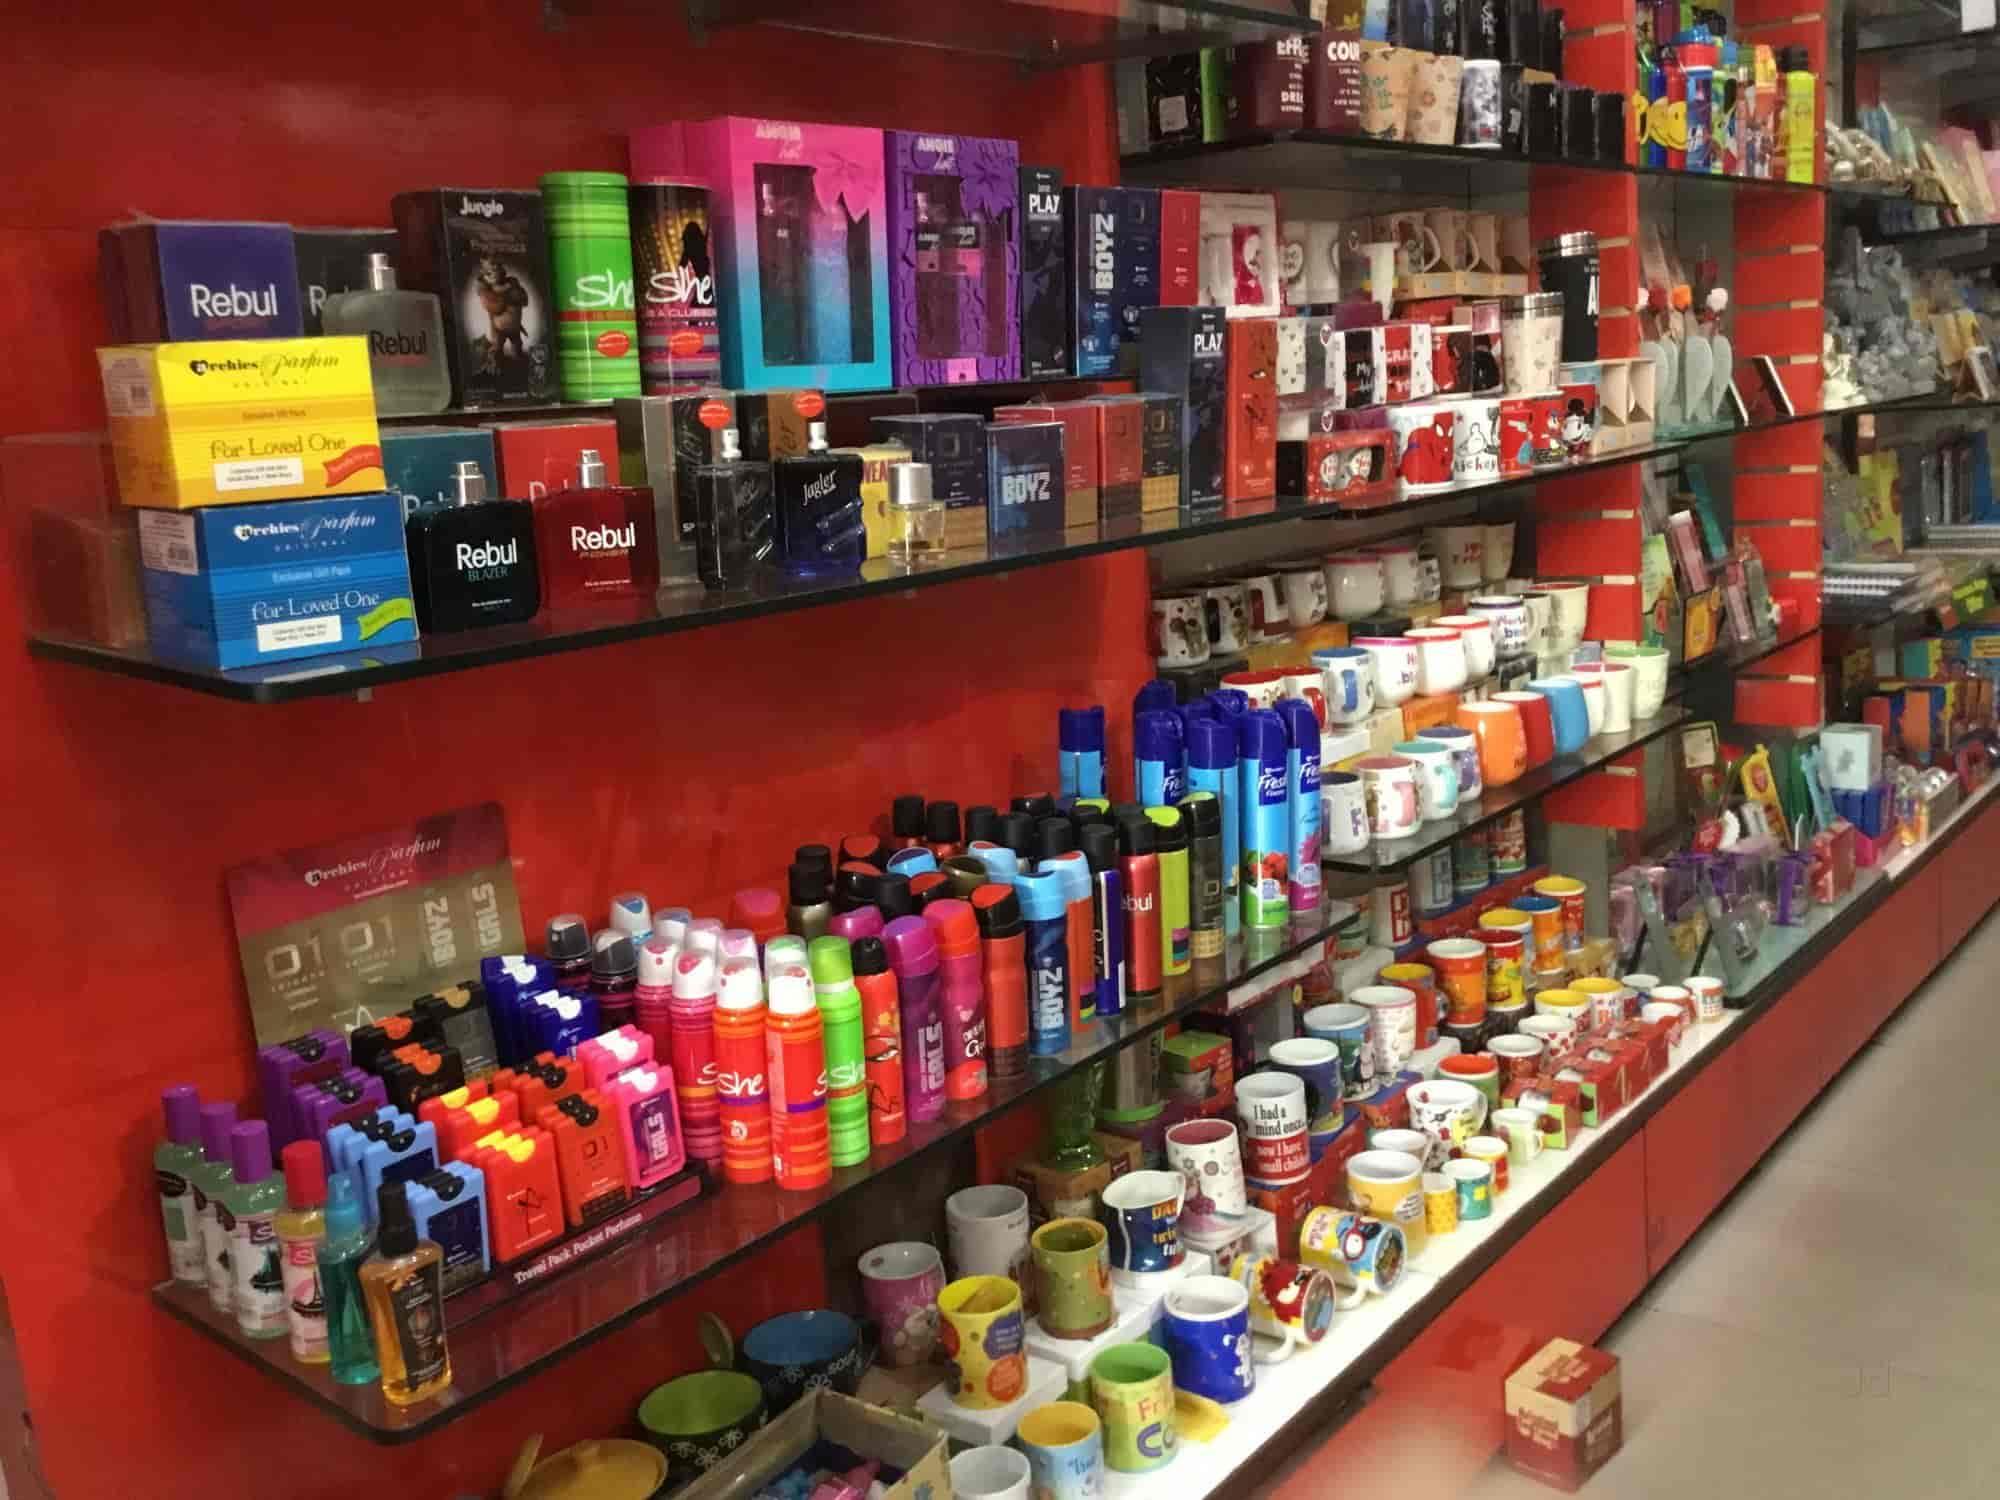 Archery, Panchkula Sector 11 - Gift Shops in Panchkula, Chandigarh